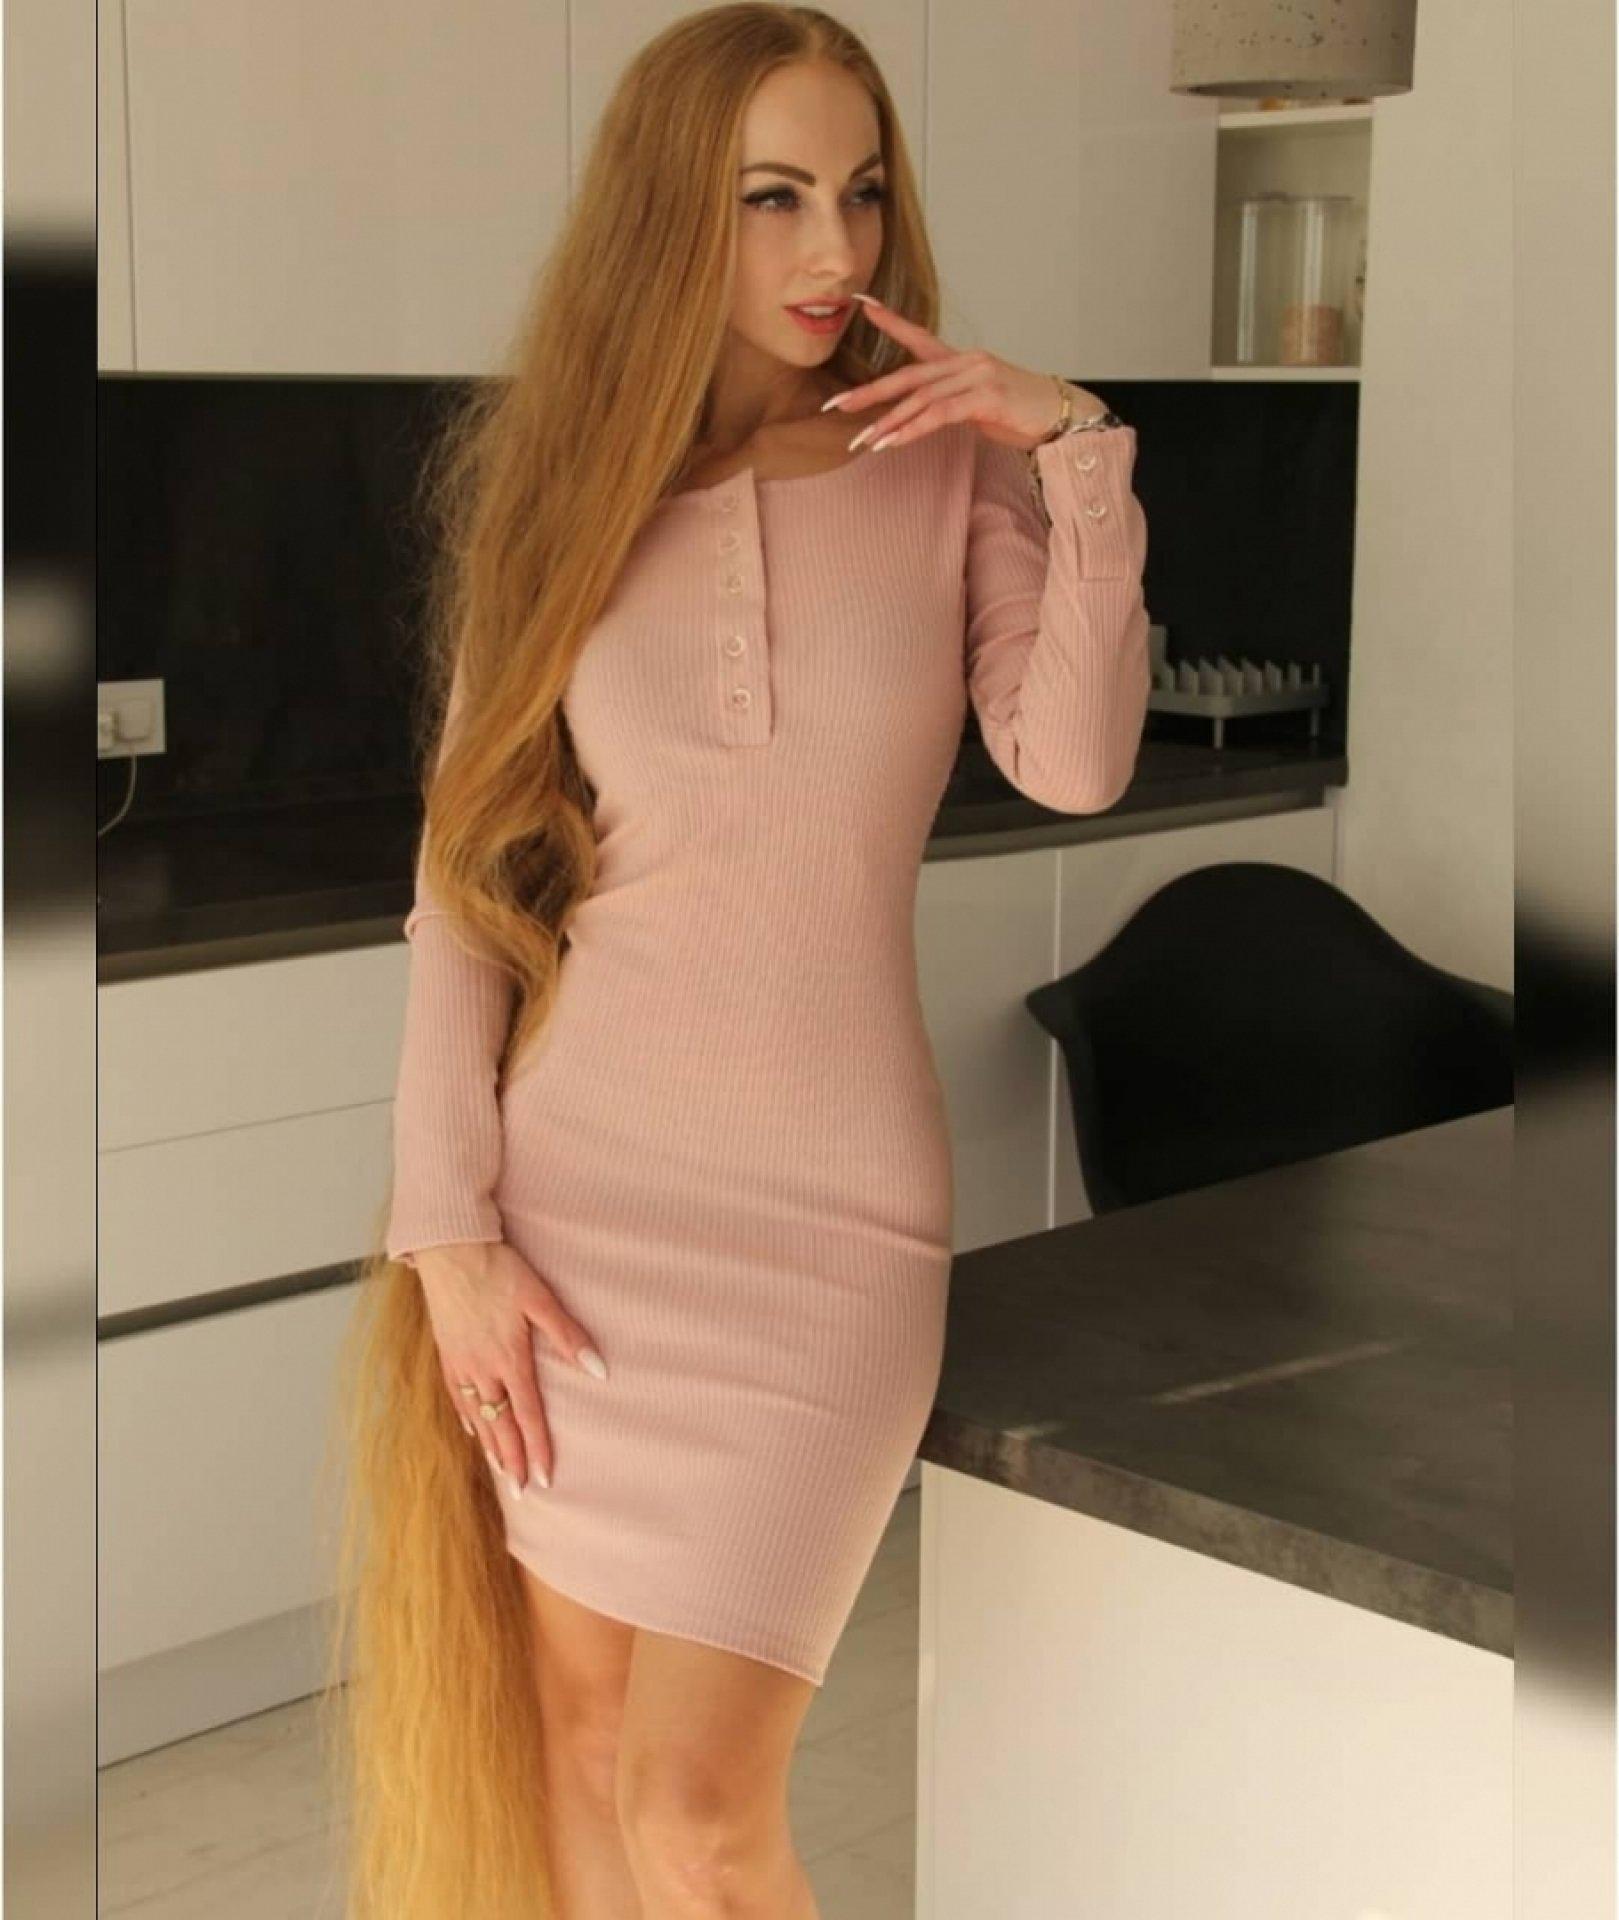 Resultado de imagem para Alena Kravchenko